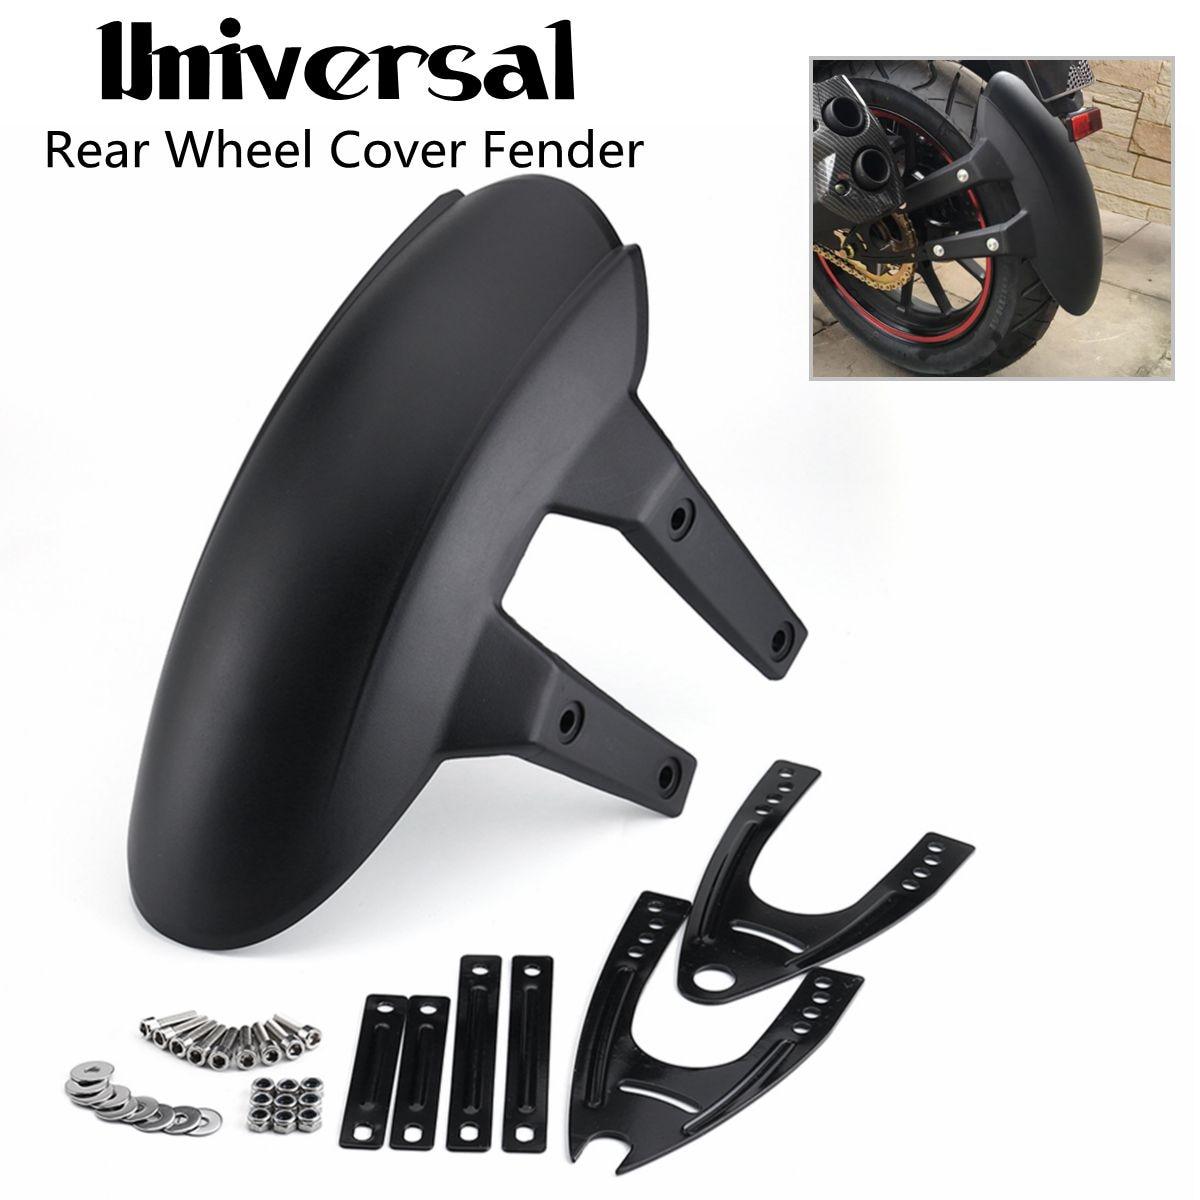 38.5cm Universal Motorcycle Rear Mud Flaps Fender Flares Wheel Cover Motorbike Splash Guard Adjustable Mudguard With Bracket все цены